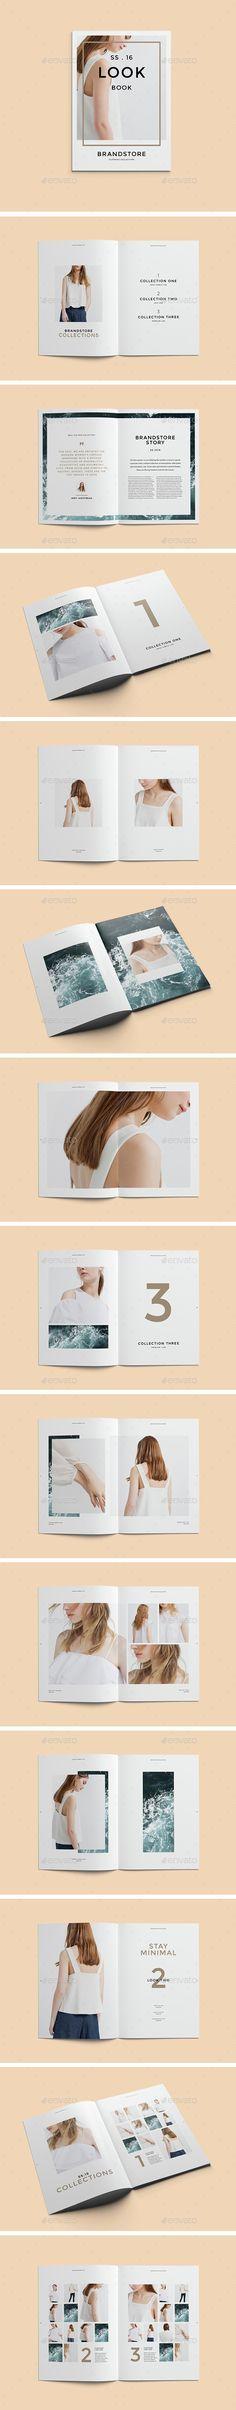 Fashion Lookbook Template InDesign INDD. Download here: http://graphicriver.net/item/fashion-lookbook/15042234?ref=ksioks